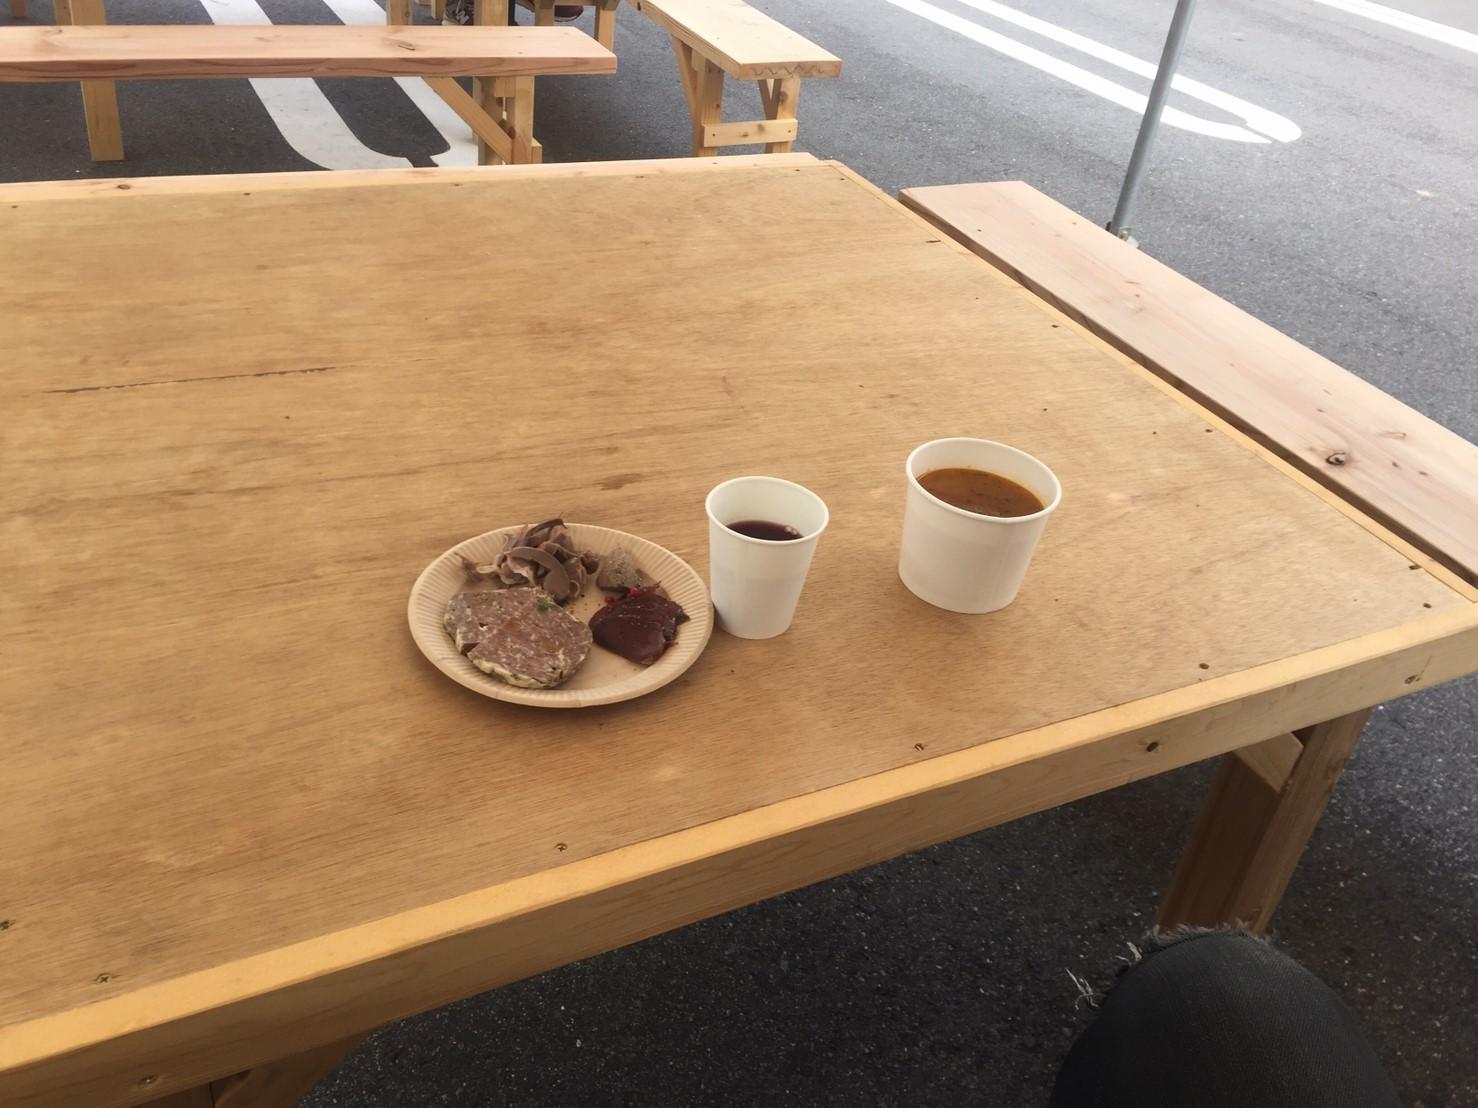 西郷工芸祭り・三滝渓_e0115904_15420307.jpg